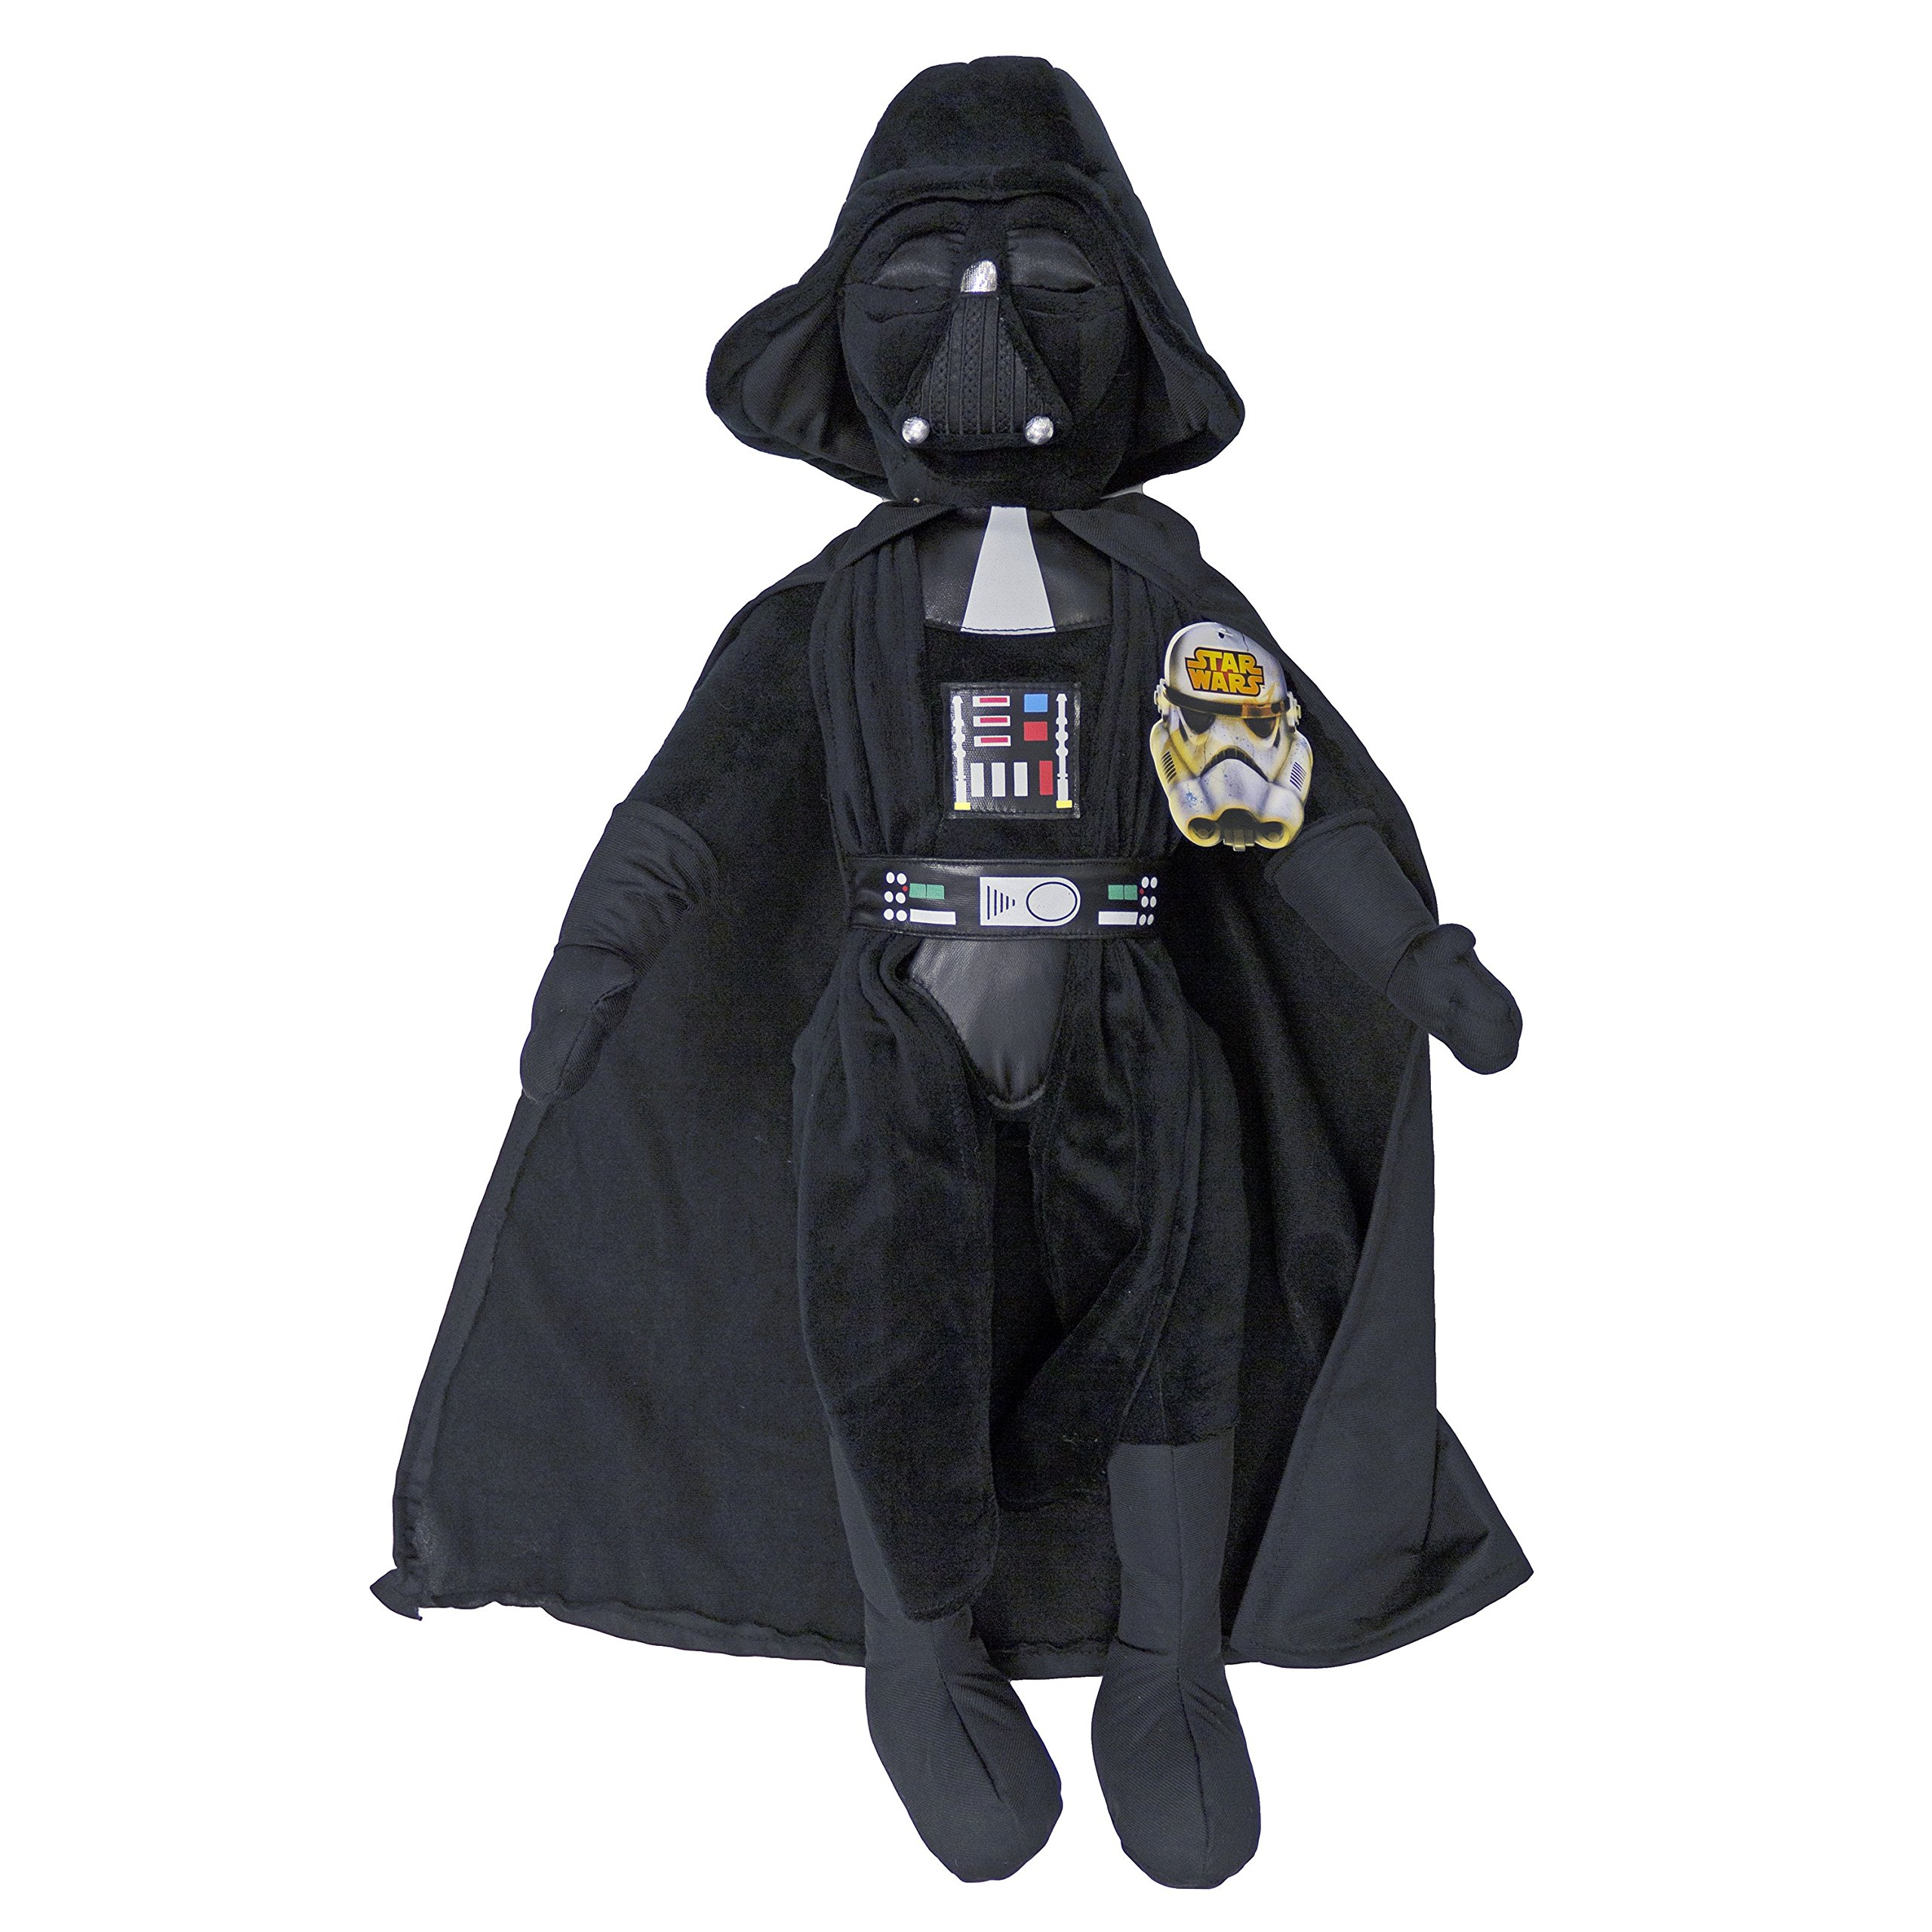 5 Piece Kids Black Star Wars Theme Comforter Twin, Starwars Millennium Falcon R2-D2 C-3PO Bedding, Light Saber Death Star Darth Vader Luke Skywalker Yoda Movie Series Character Plush, Polyester